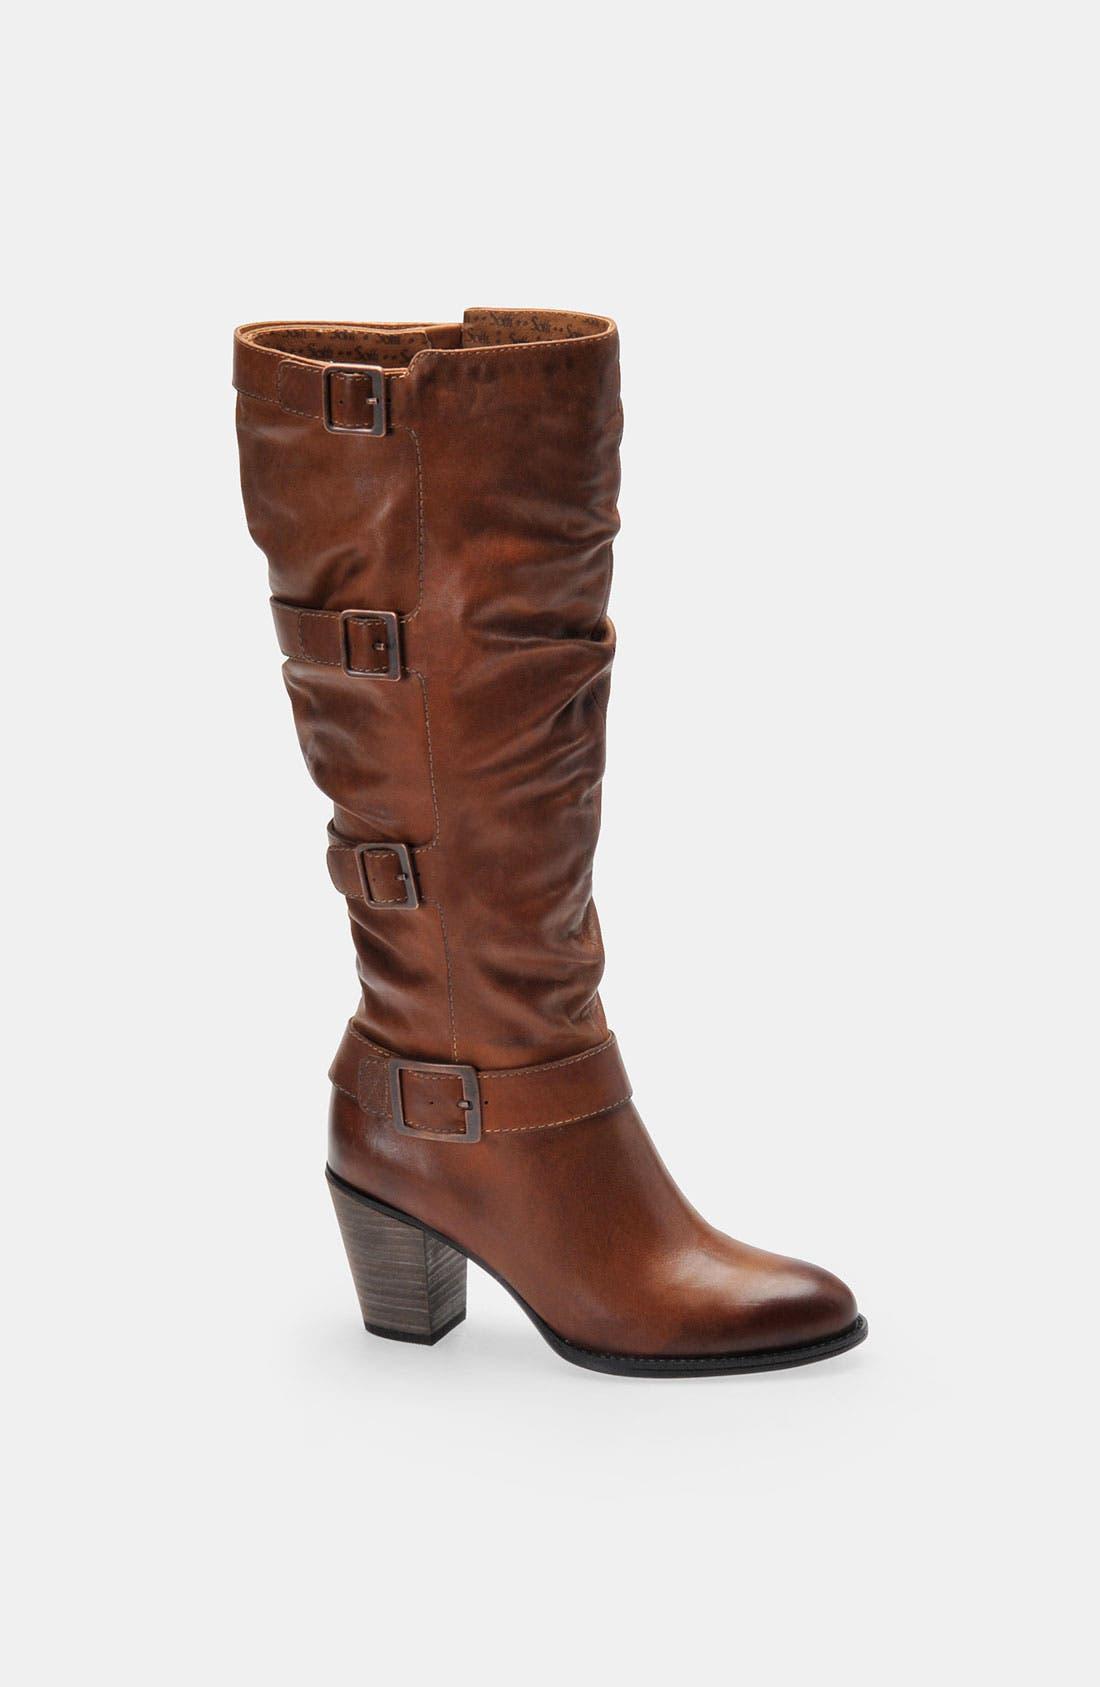 Alternate Image 1 Selected - Söfft 'Colorado' Tall Boot